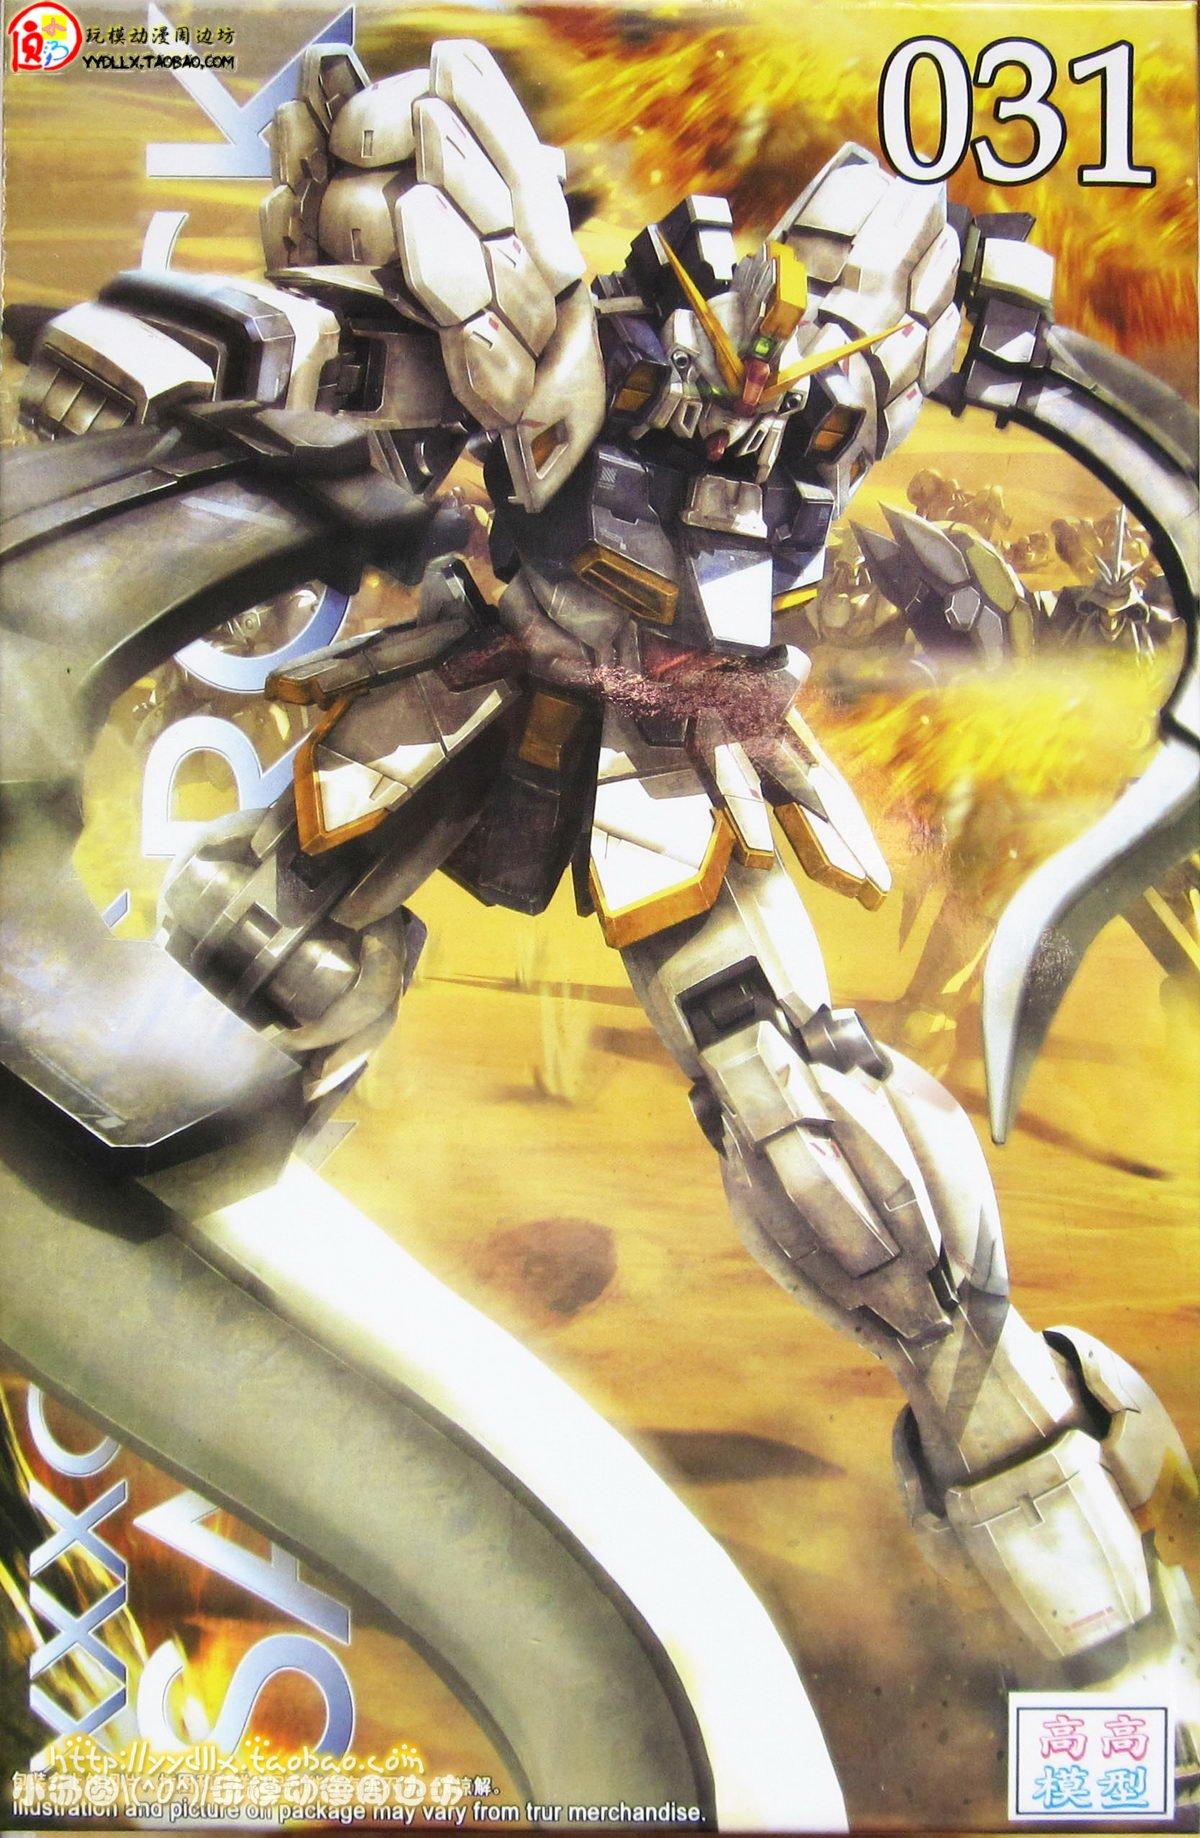 Gundam Self Assembled Kit MG 1/100 SANDROCK EW KA GUNDAM Boy's Toy,Robot Model Building , collection, classic toys(China (Mainland))